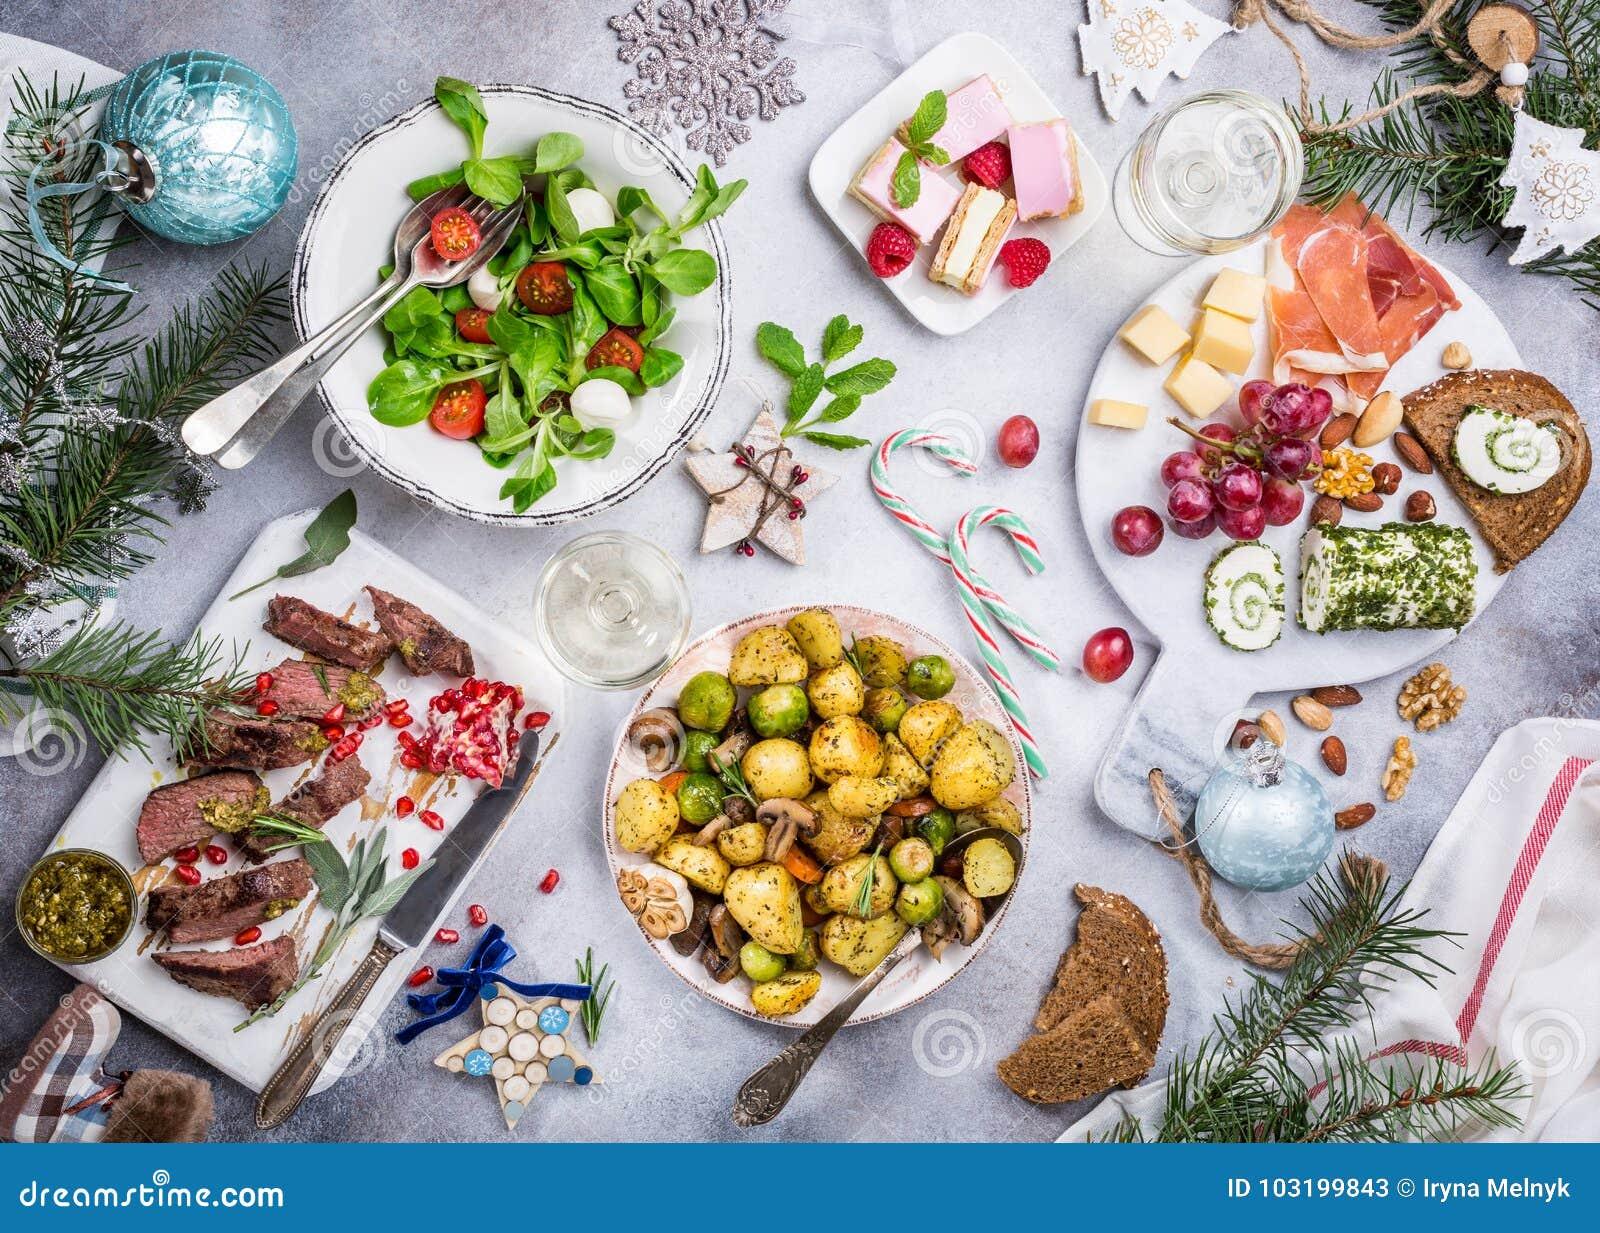 Christmas Themed Food.Christmas Themed Dinner Table Stock Image Image Of Gourmet